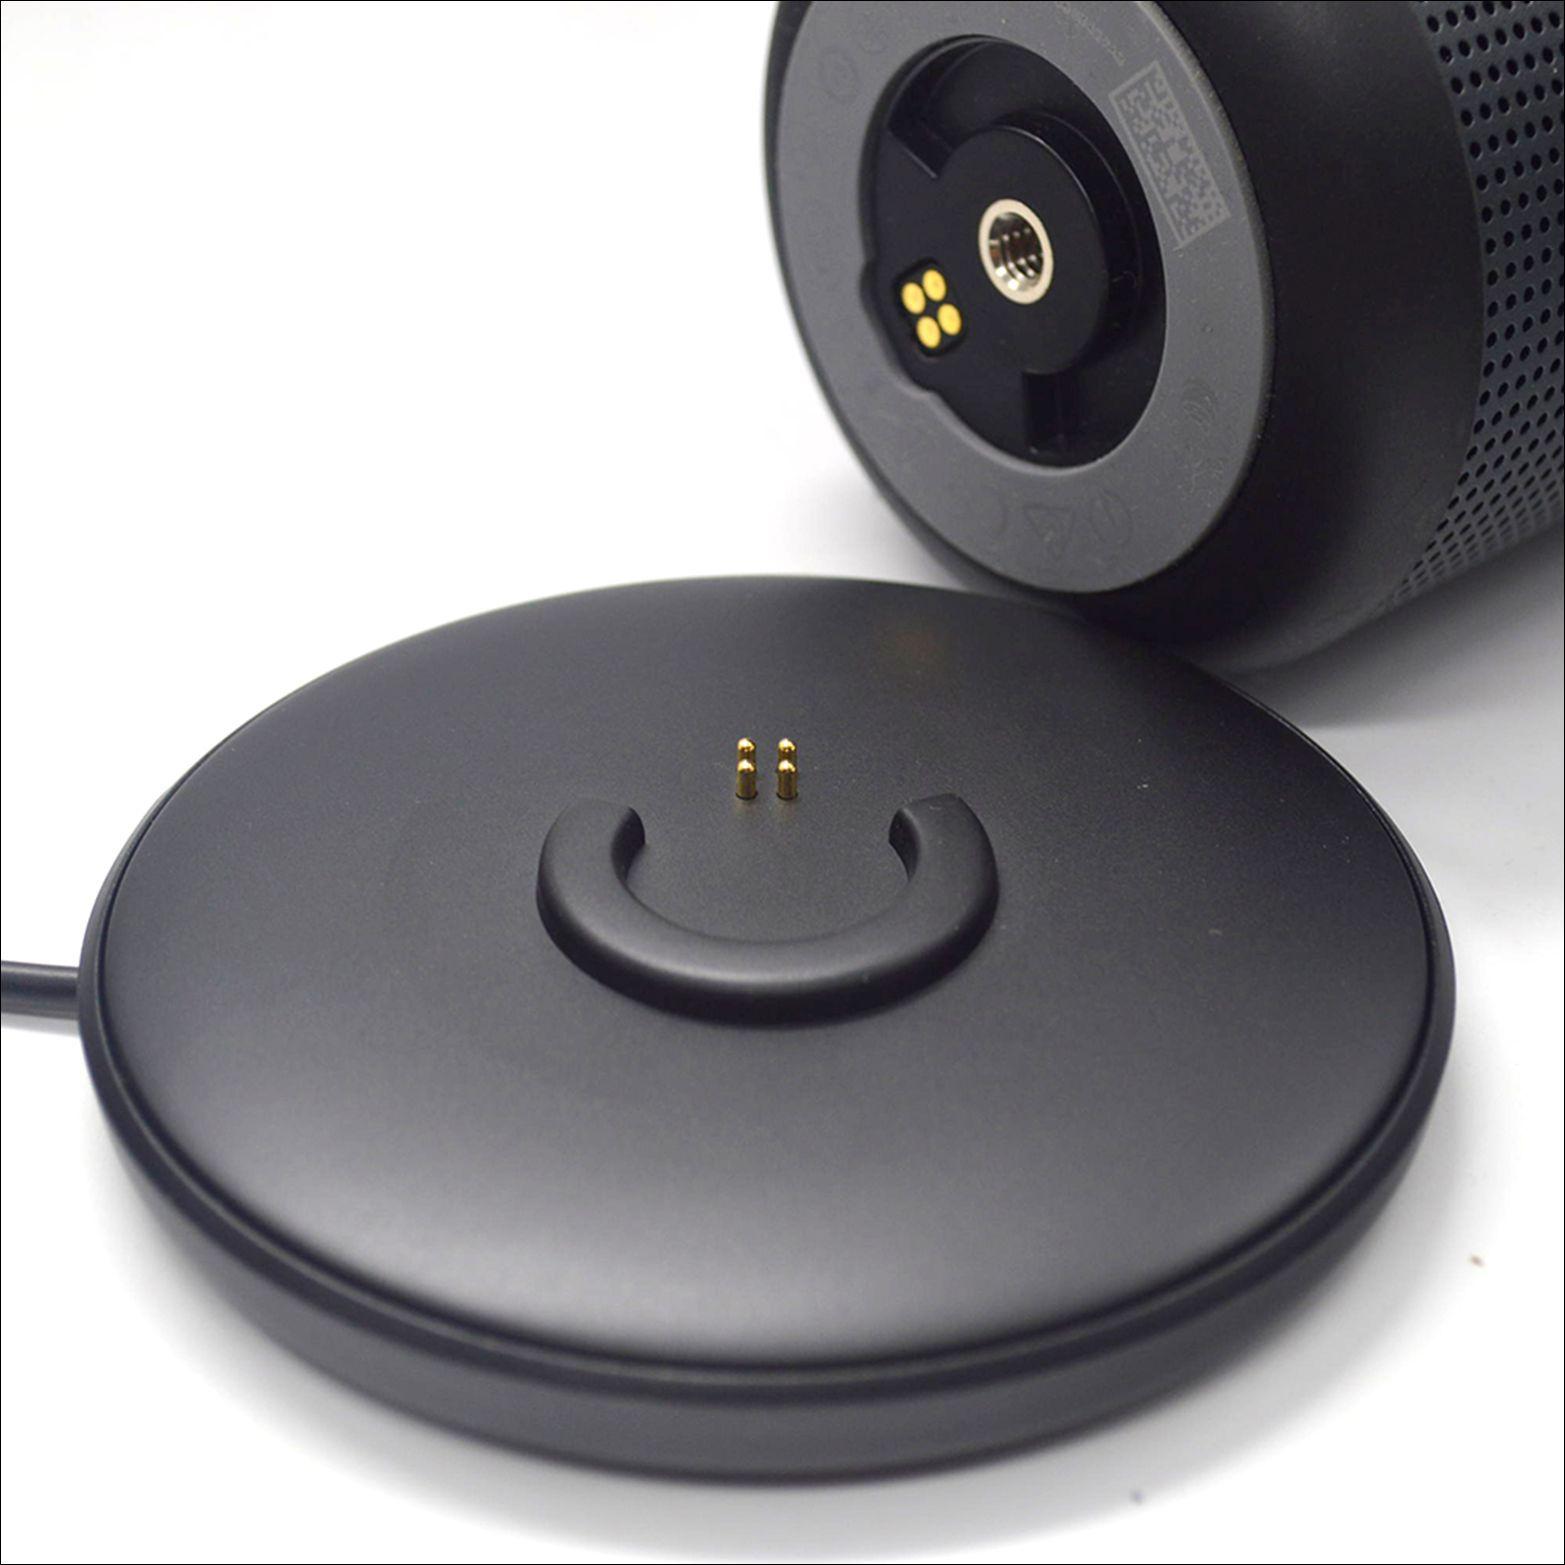 Bose Bluetooth Speaker Charging Base (7).png